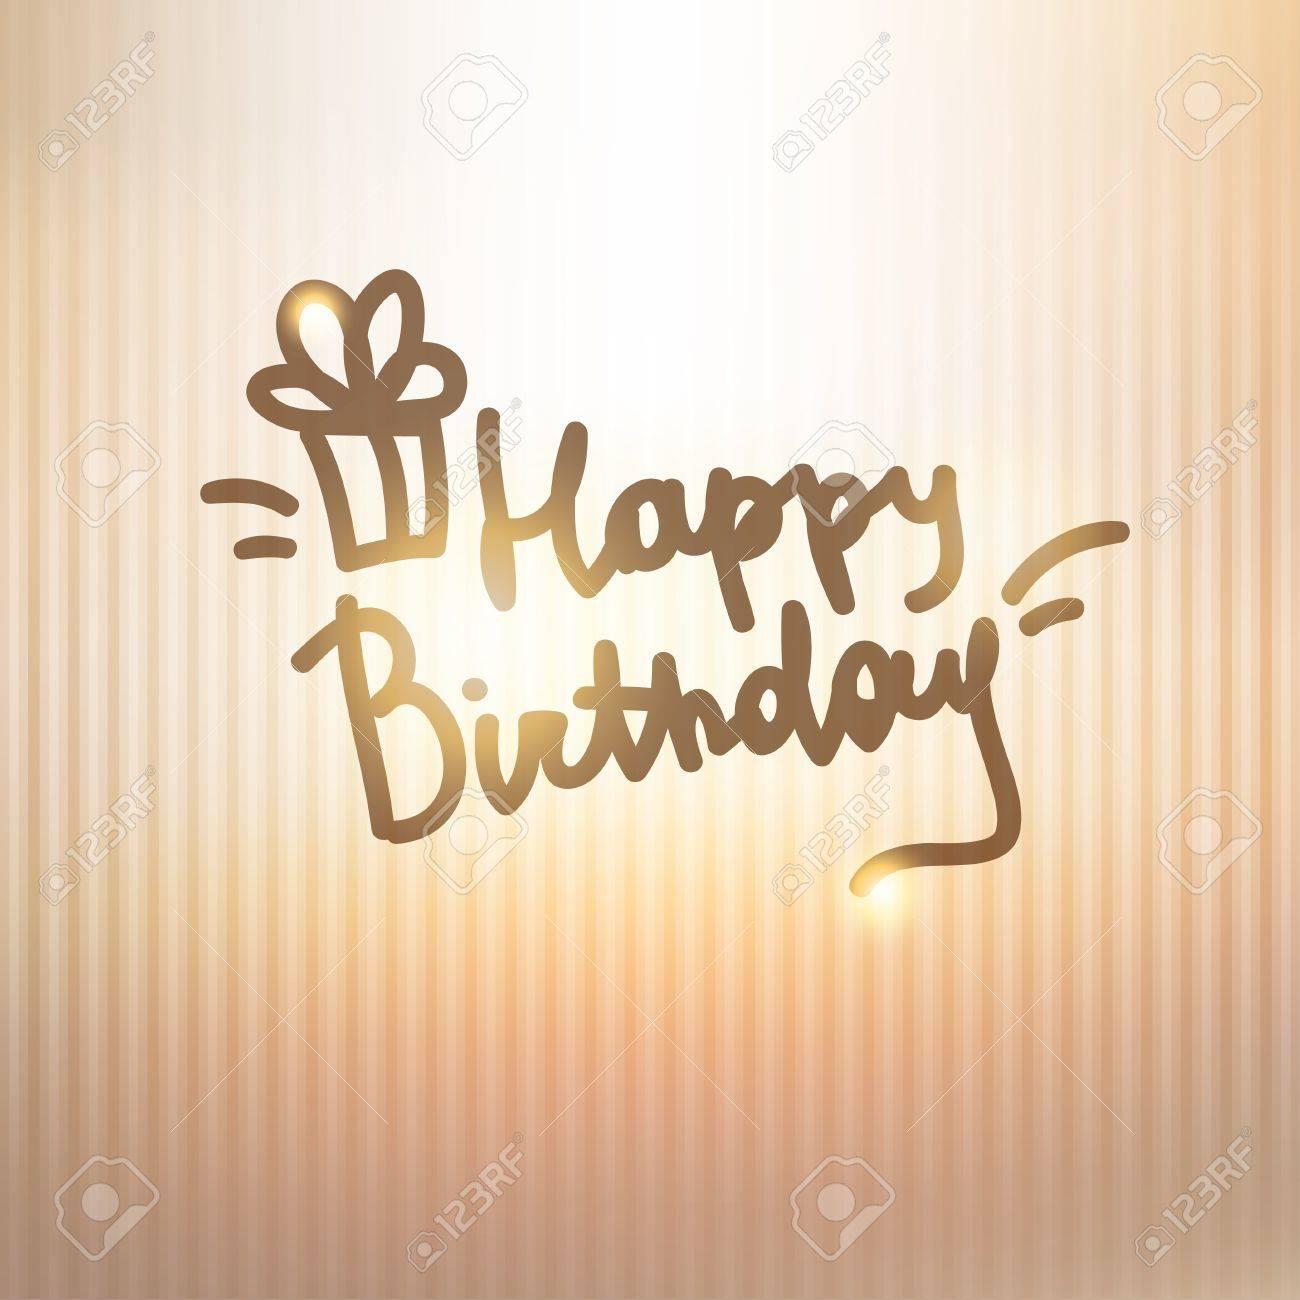 happy birthday, handwriting lettering Stock Vector - 21006227